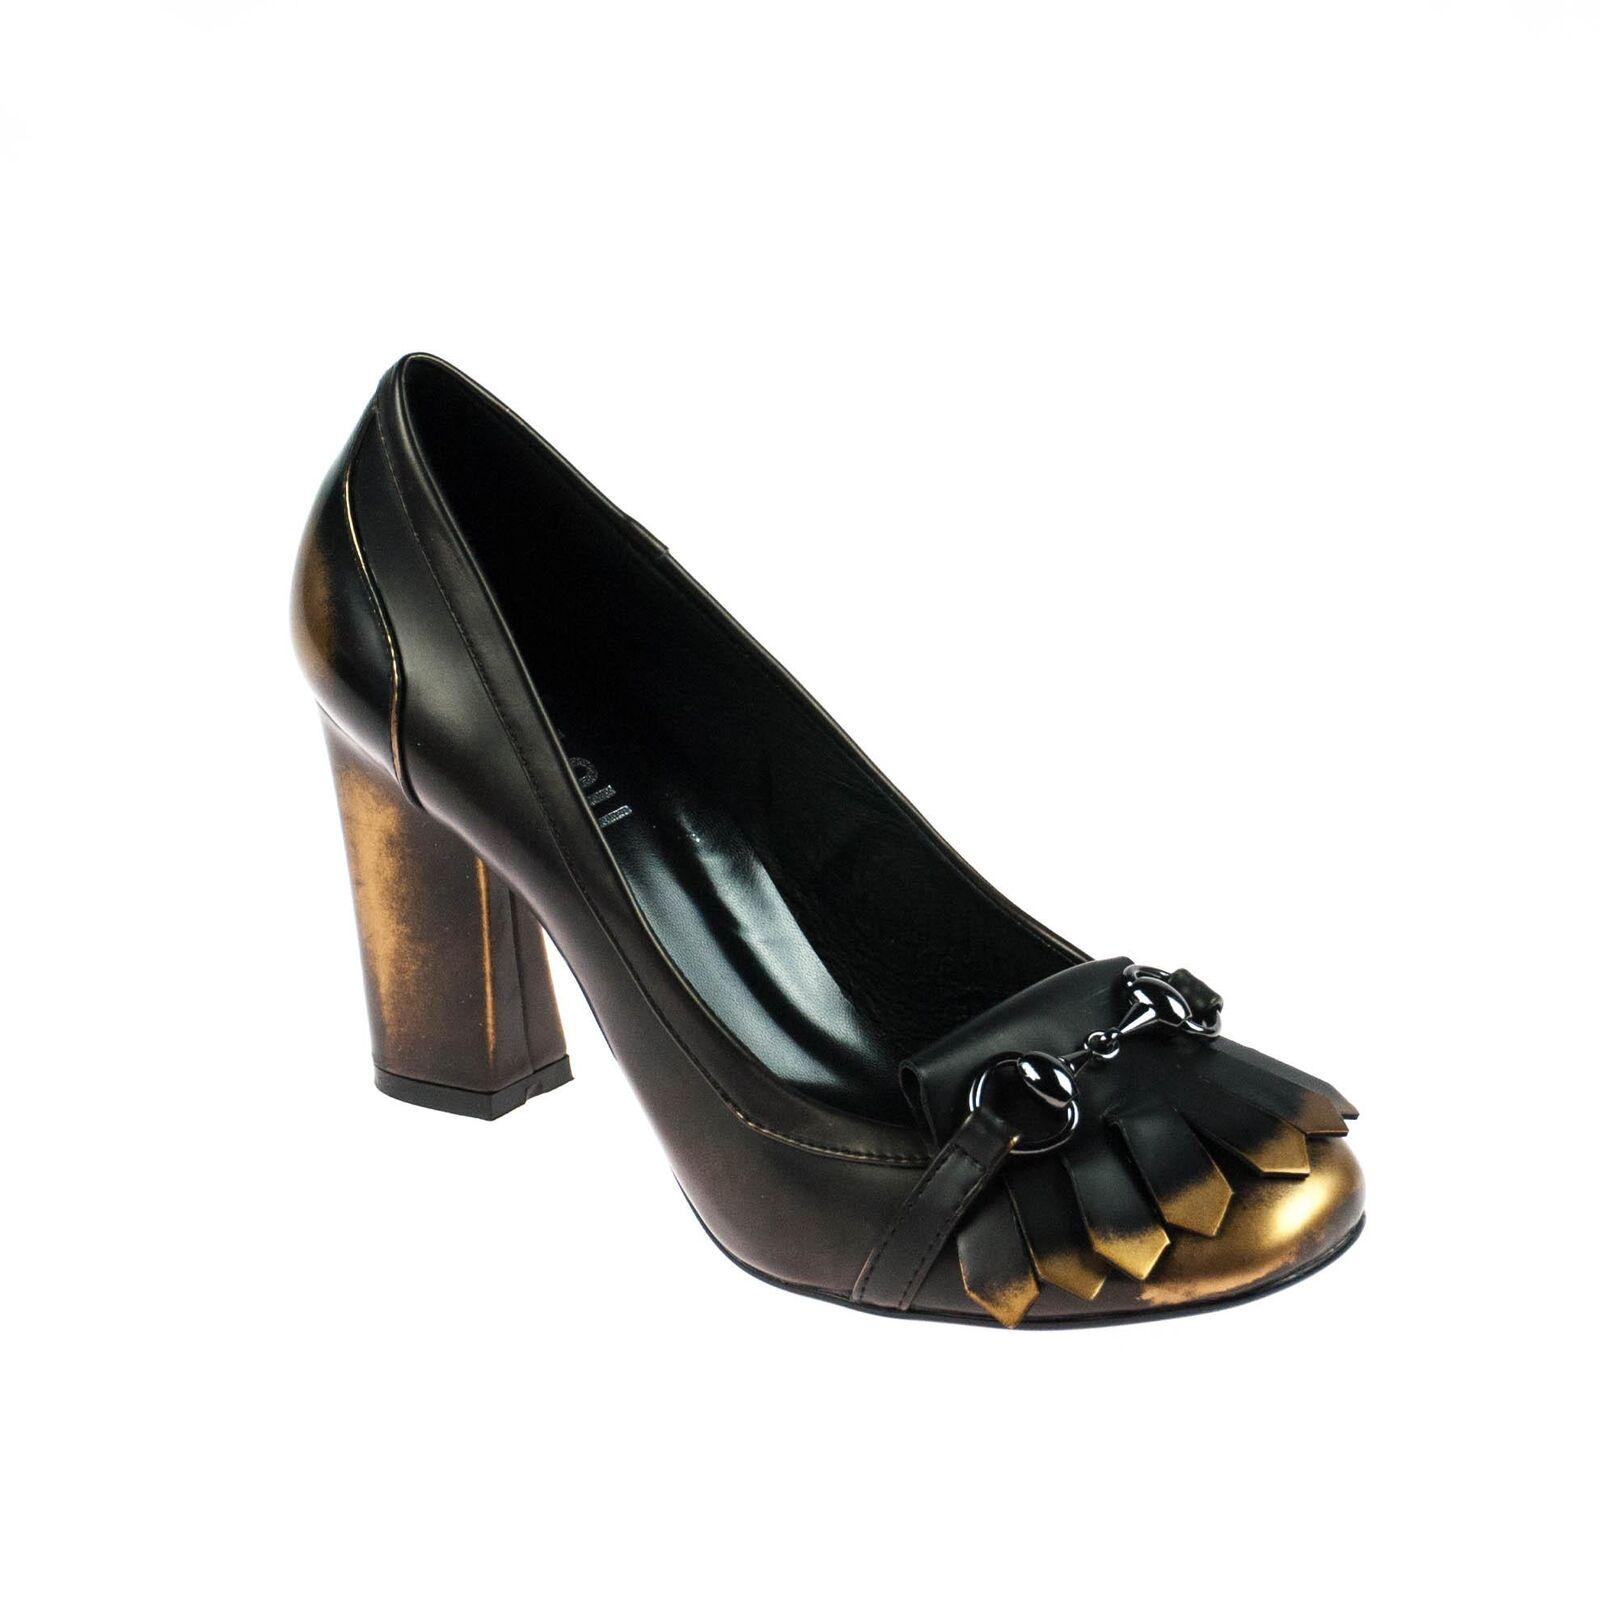 Bibi Lou señora pumps cuero bronce tamaño 40